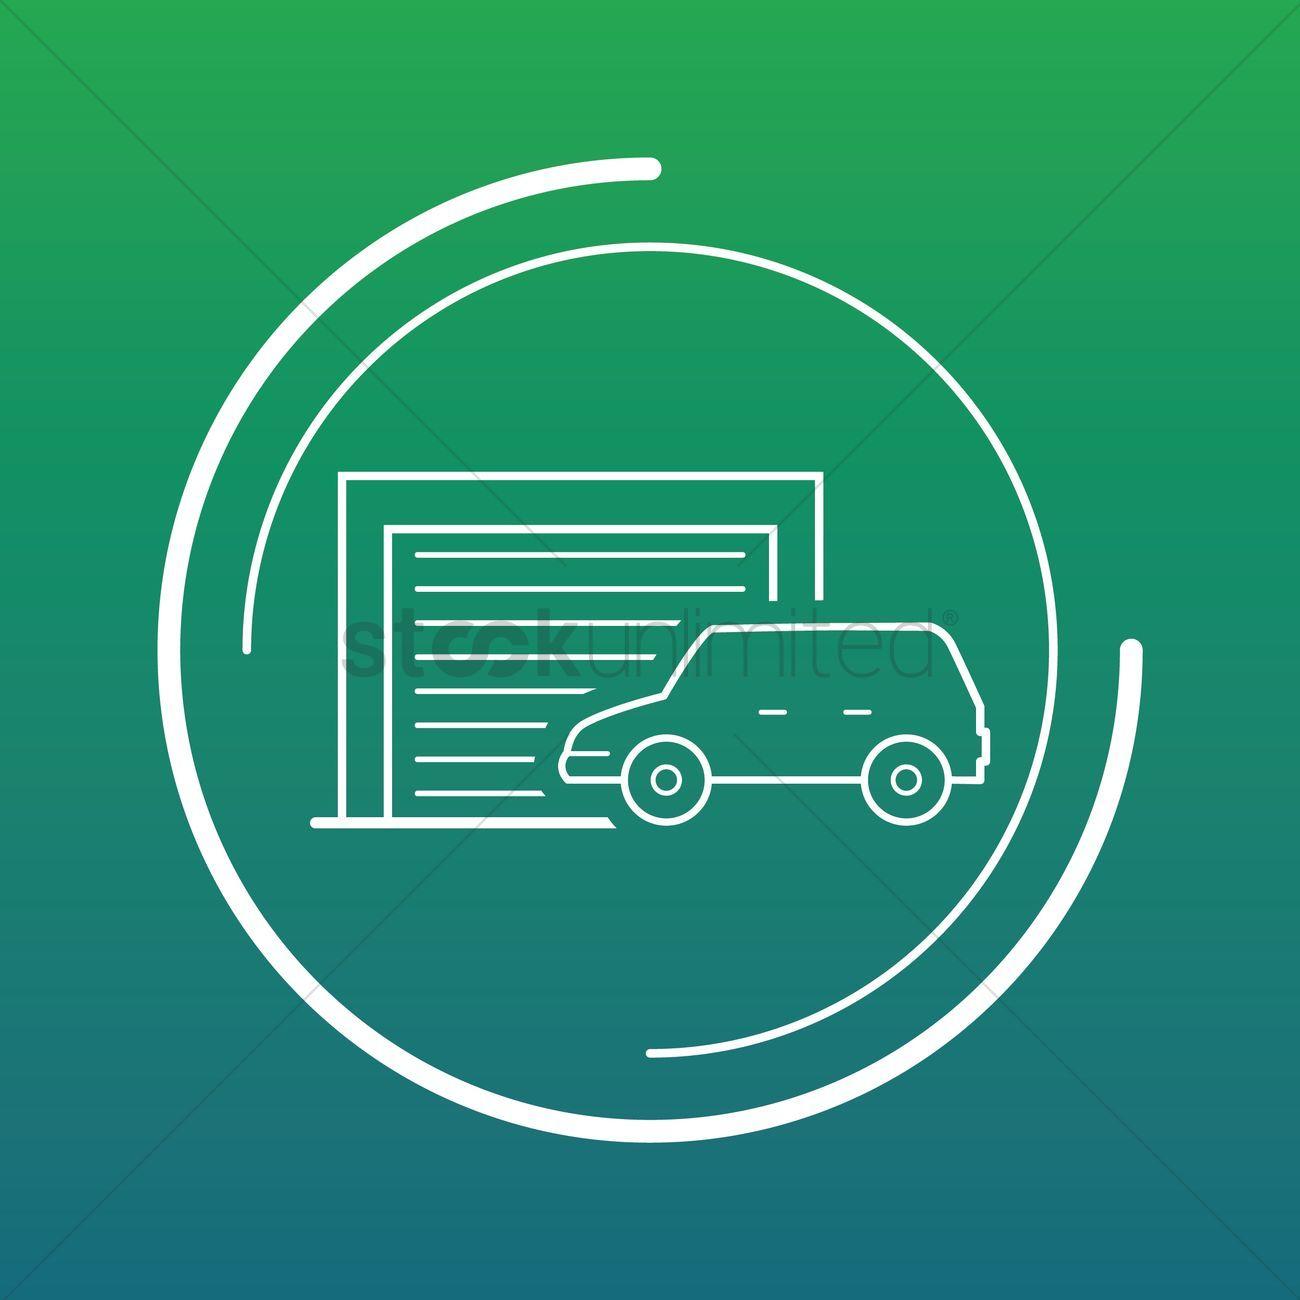 Car Garage Vectors Stock Clipart Aff Garage Car Vectors Clipart Stock Affiliate In 2020 Photography